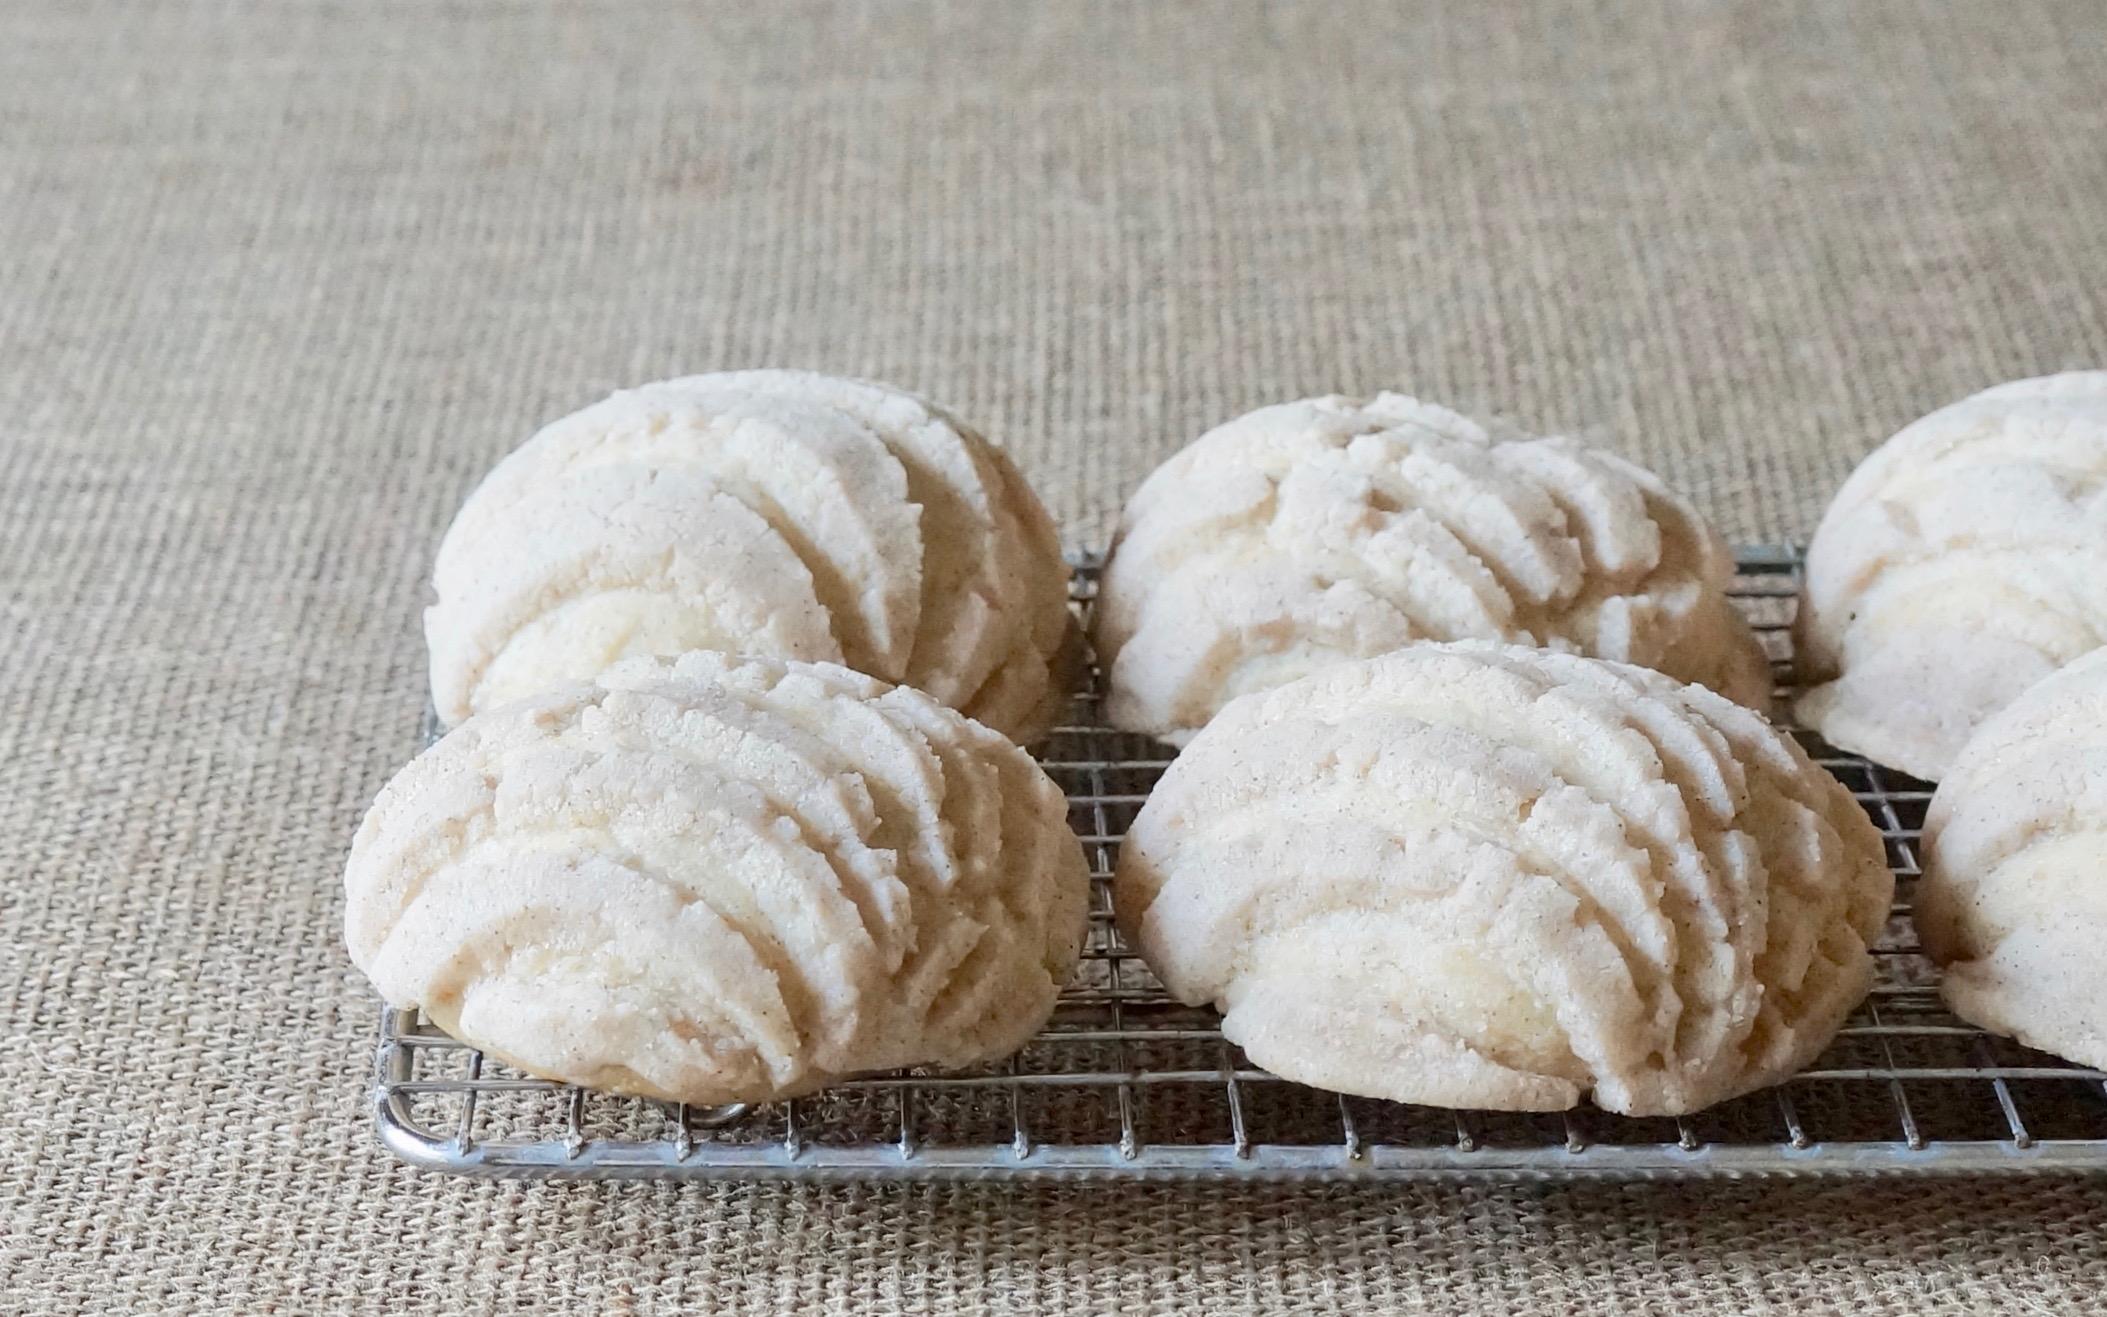 How-Do-You-Make-Buttermilk-Conchas-Rebecca-Gordon-Editor-In-Chief-Buttermilk-Lipstick-Baking-Entertaining-Tutorials-Southern-Hostess-RebeccaGordon-Pastry-Chef-Birmingham-Alabama